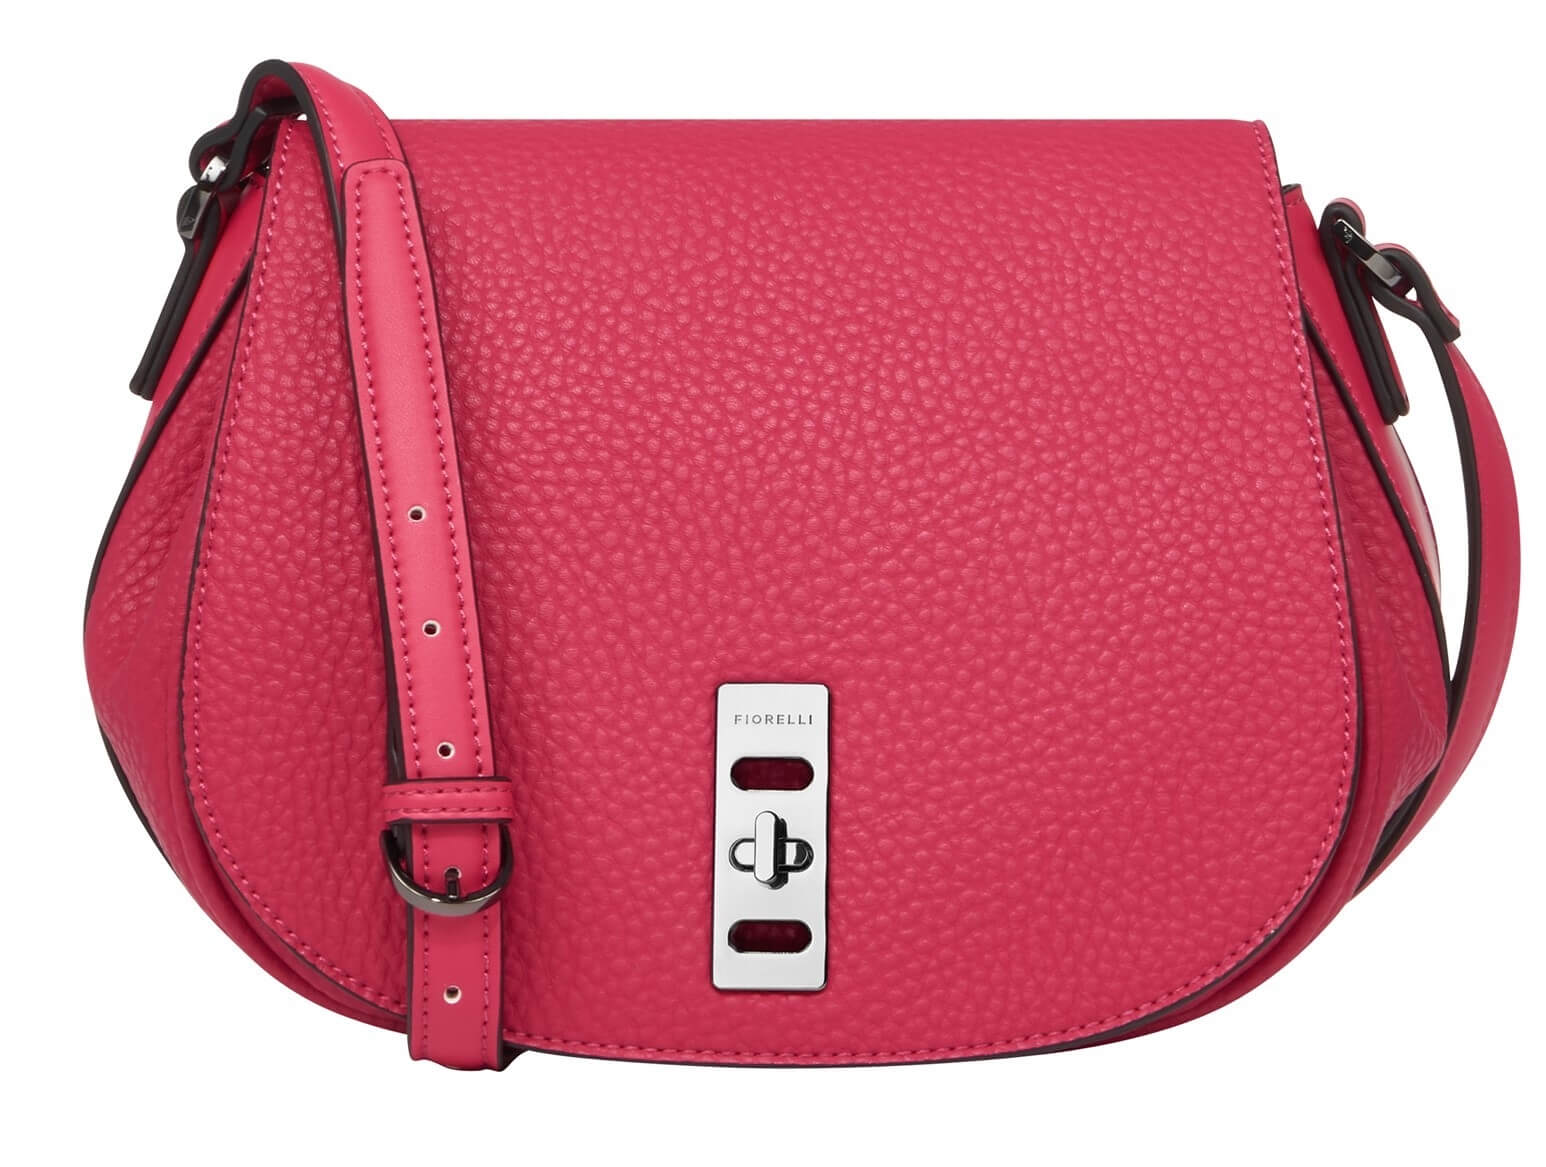 Fiorelli Elegantní kabelka Luna FWH0220 Raspberry Doprava ZDARMA ... 900ba860f65